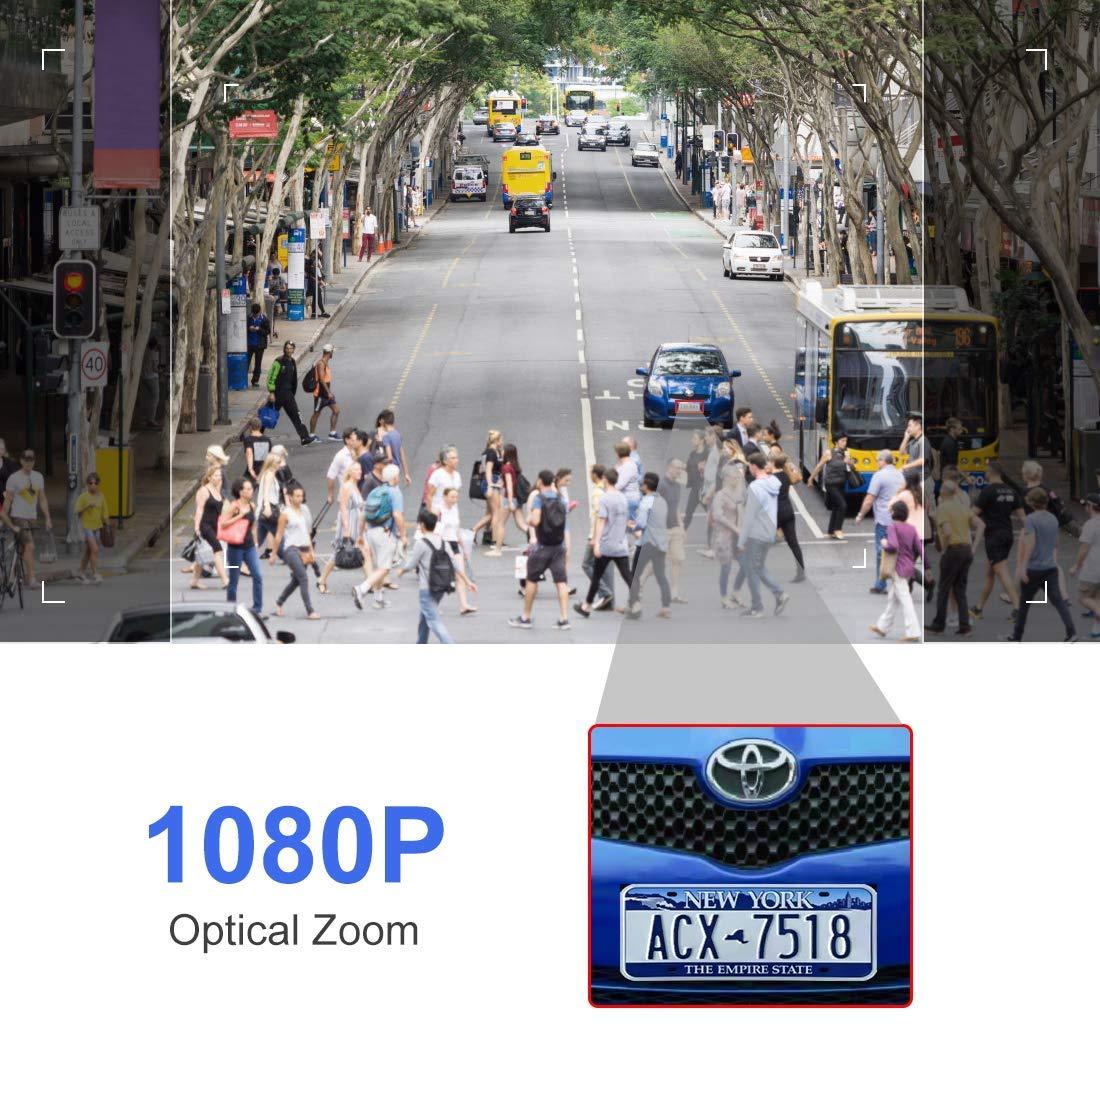 Camara IP WiFi 1080p C/ámara IP Exterior C/ámara PTZ Vigilancia Exterior WiFi Motorizada P//T Visi/ón Nocturna 20M Detecci/ón de Movimiento Monitorizaci/ón Remota v/ía PC//Smartphone//Tableta